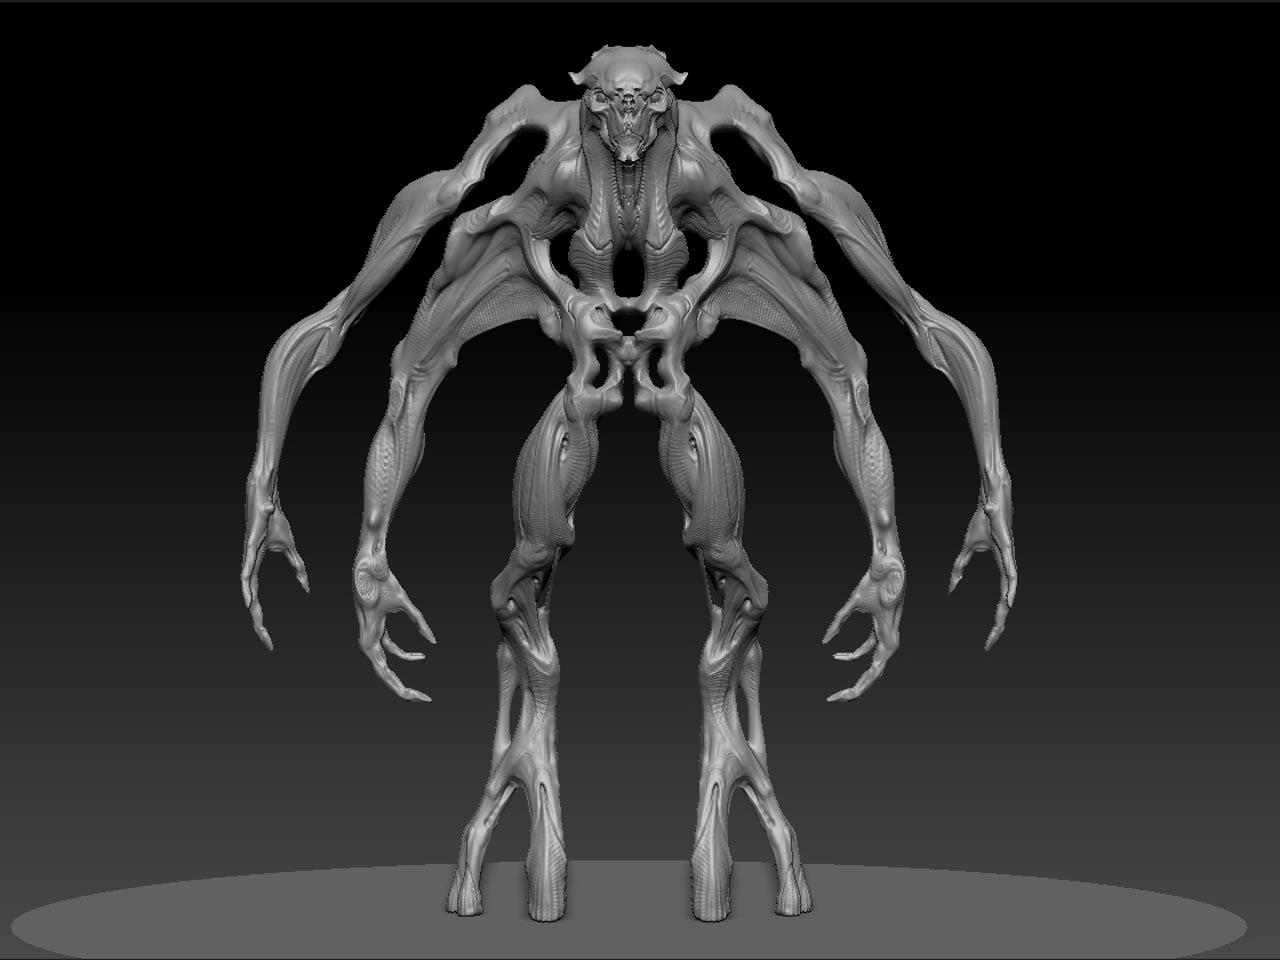 Super 8 alien by jpizzle6298 on DeviantArt |Super 8 Alien Design